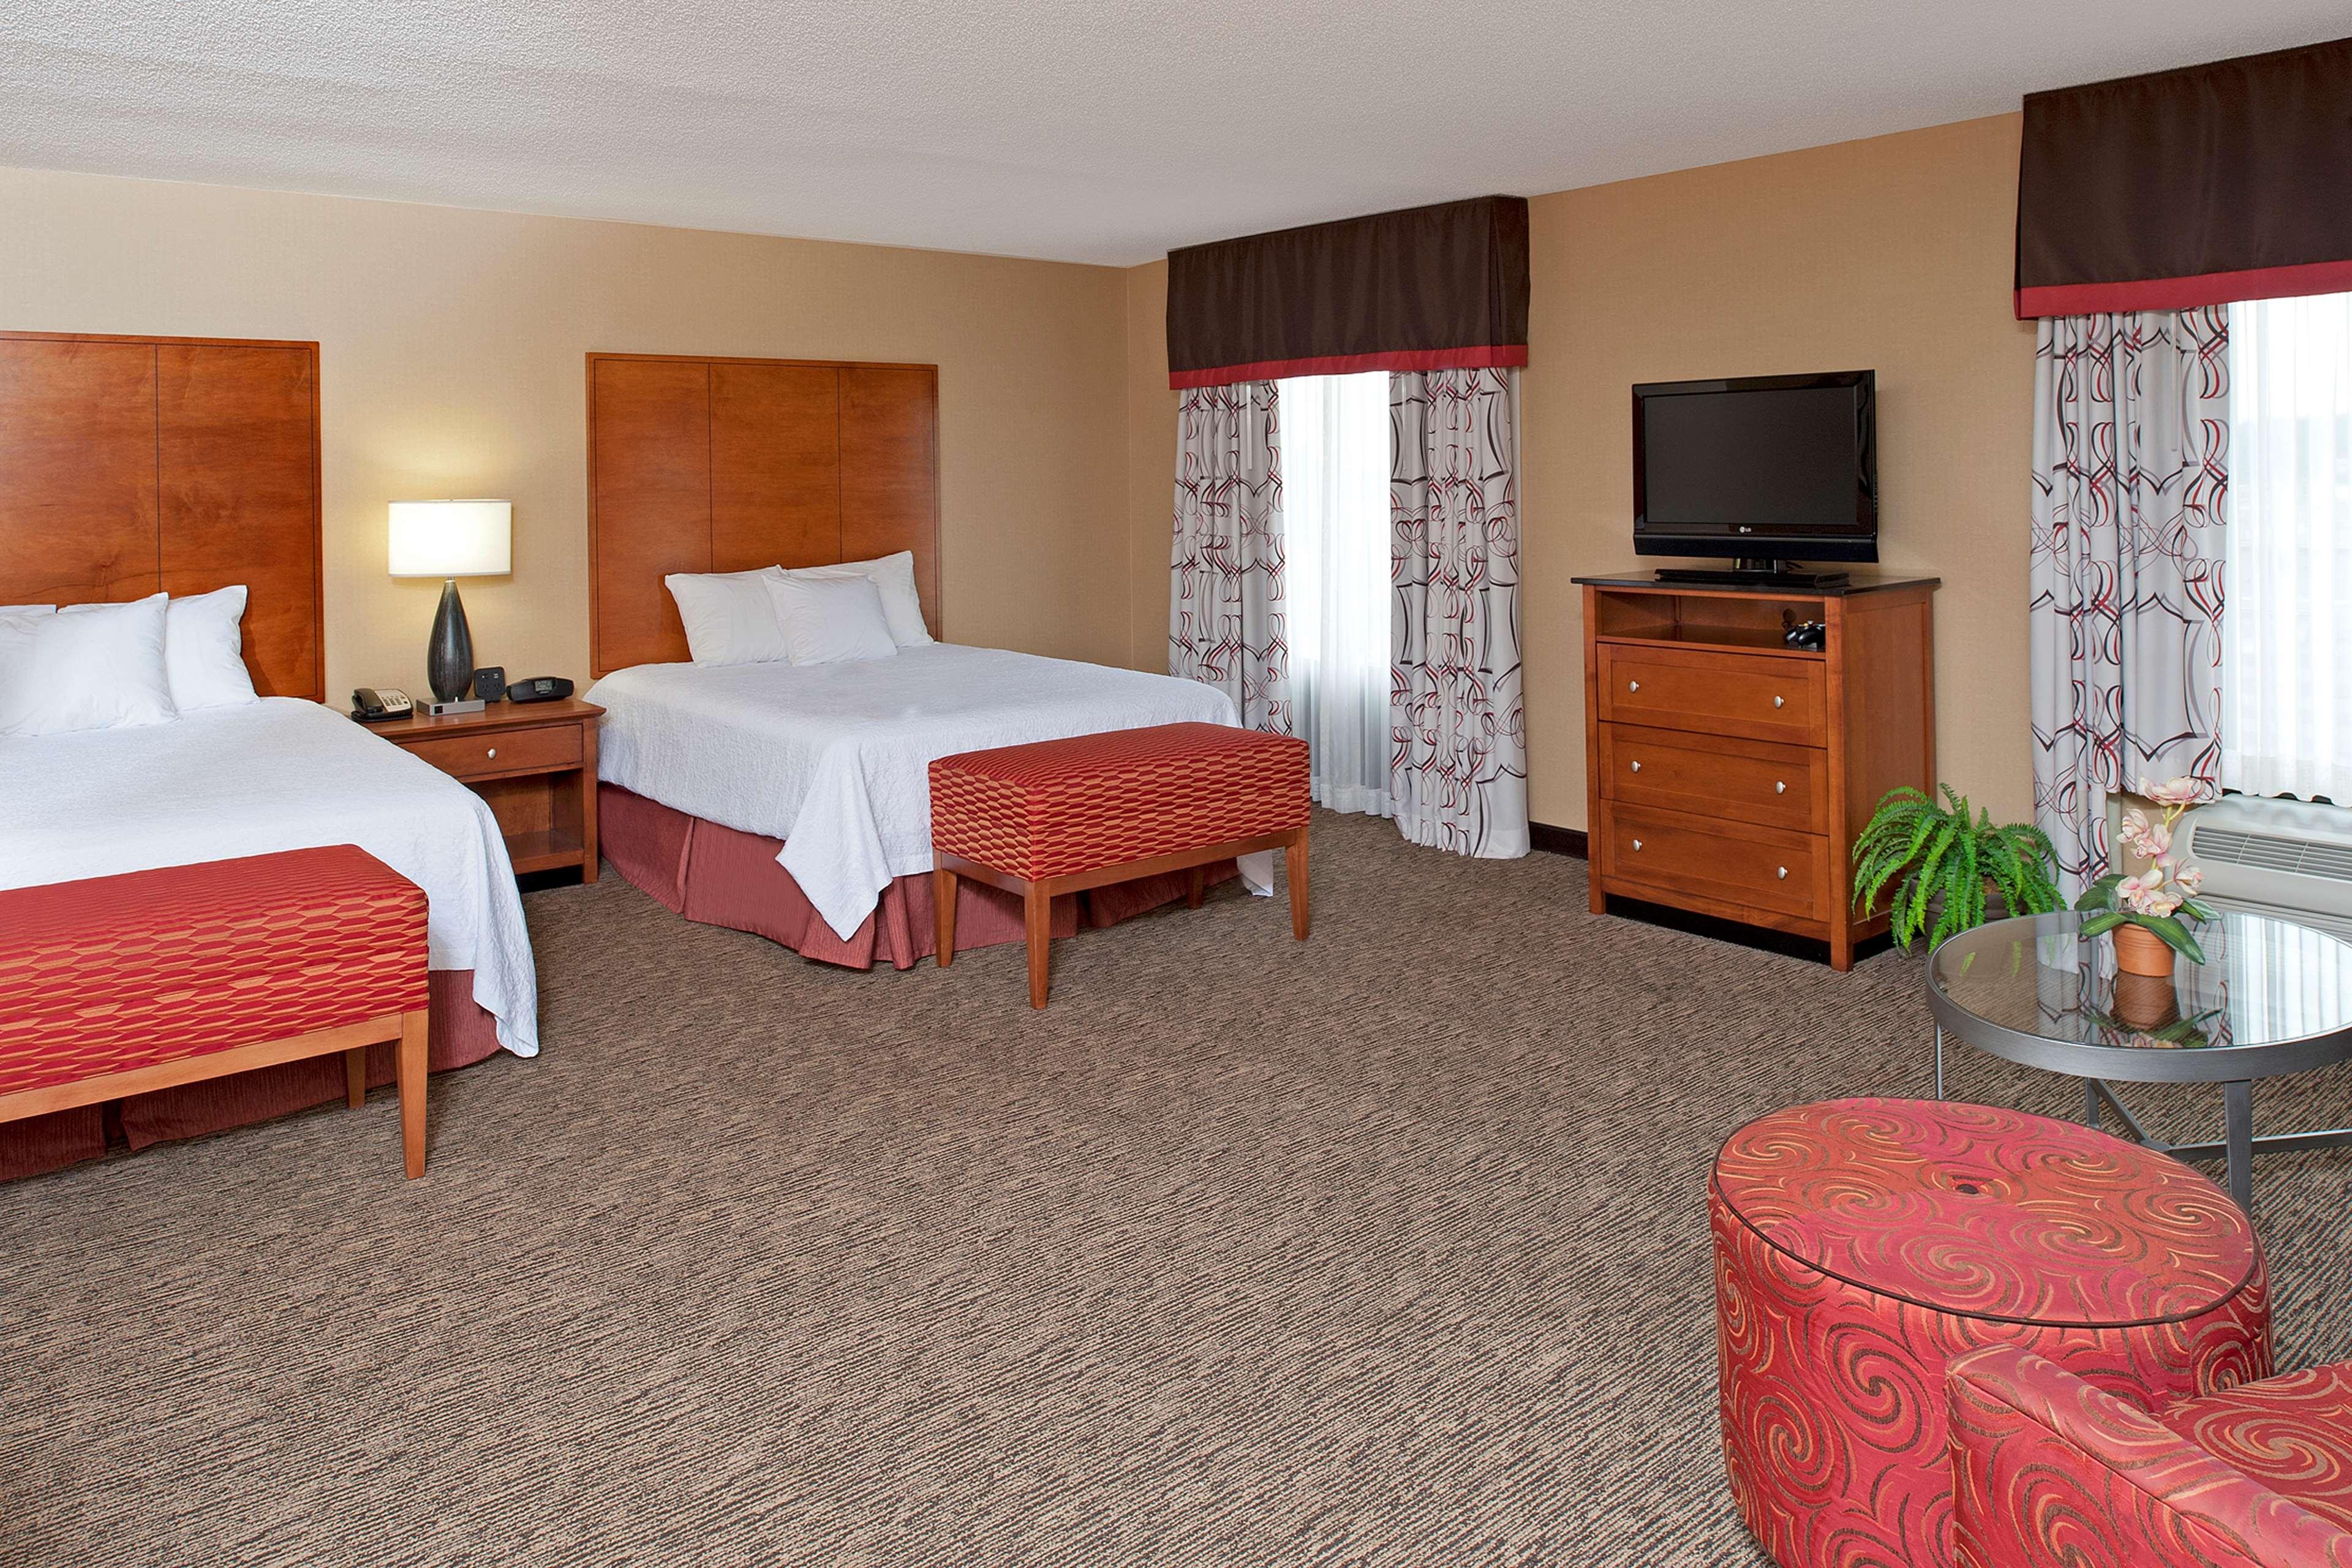 Hampton Inn & Suites Columbus-Easton Area image 26